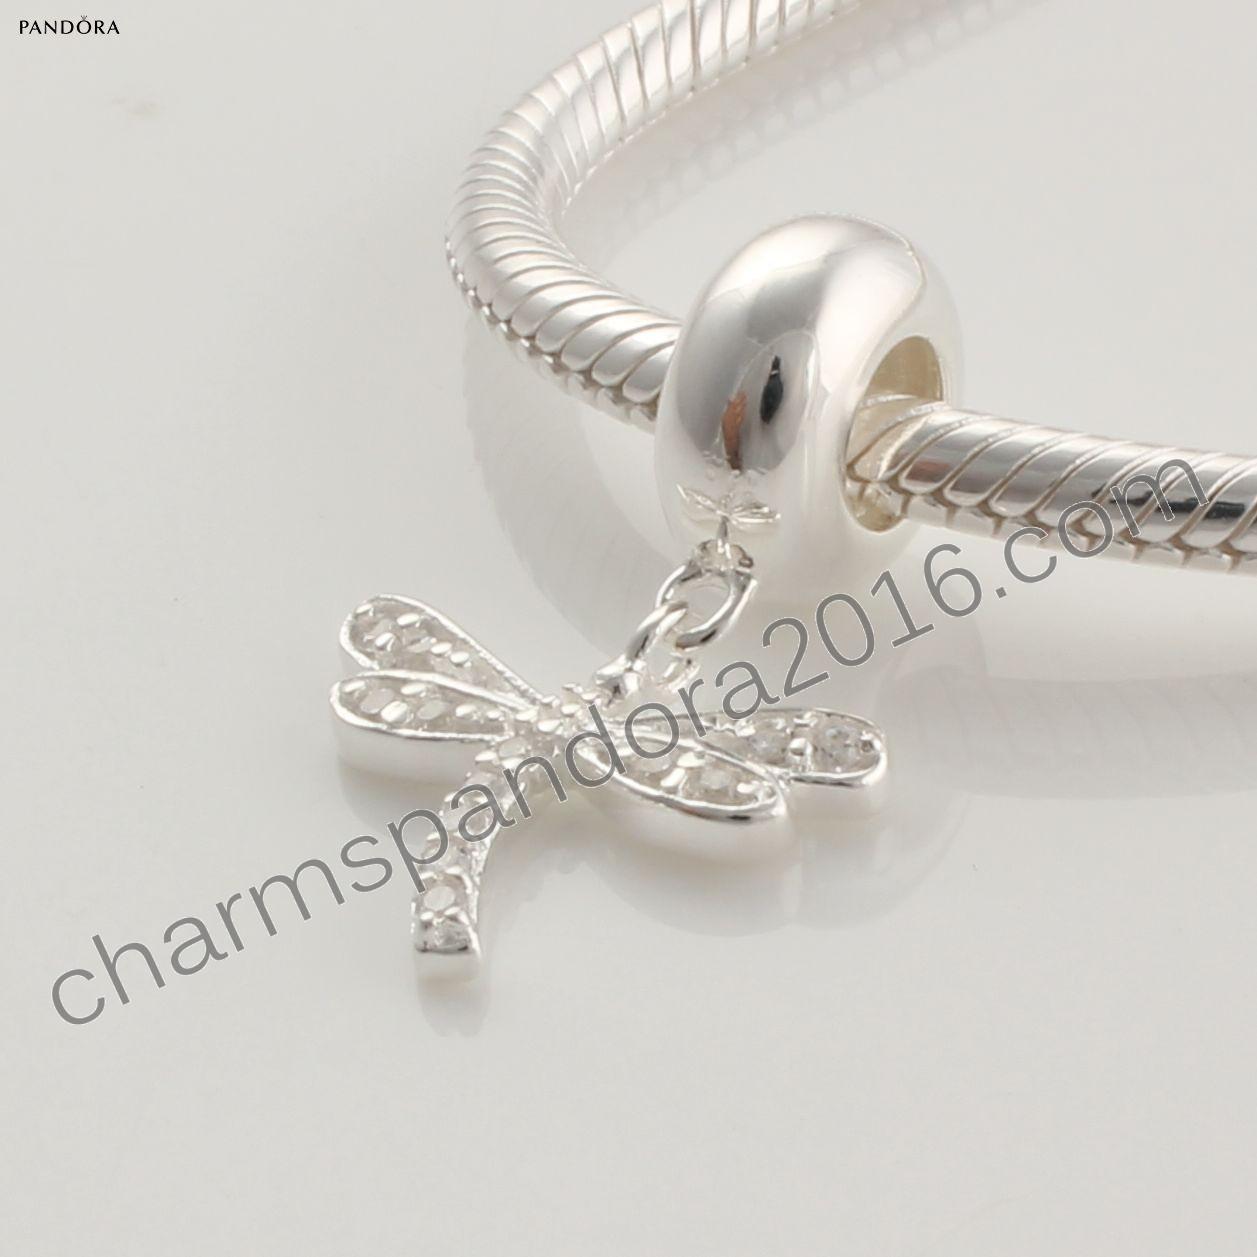 pandora charms libellule